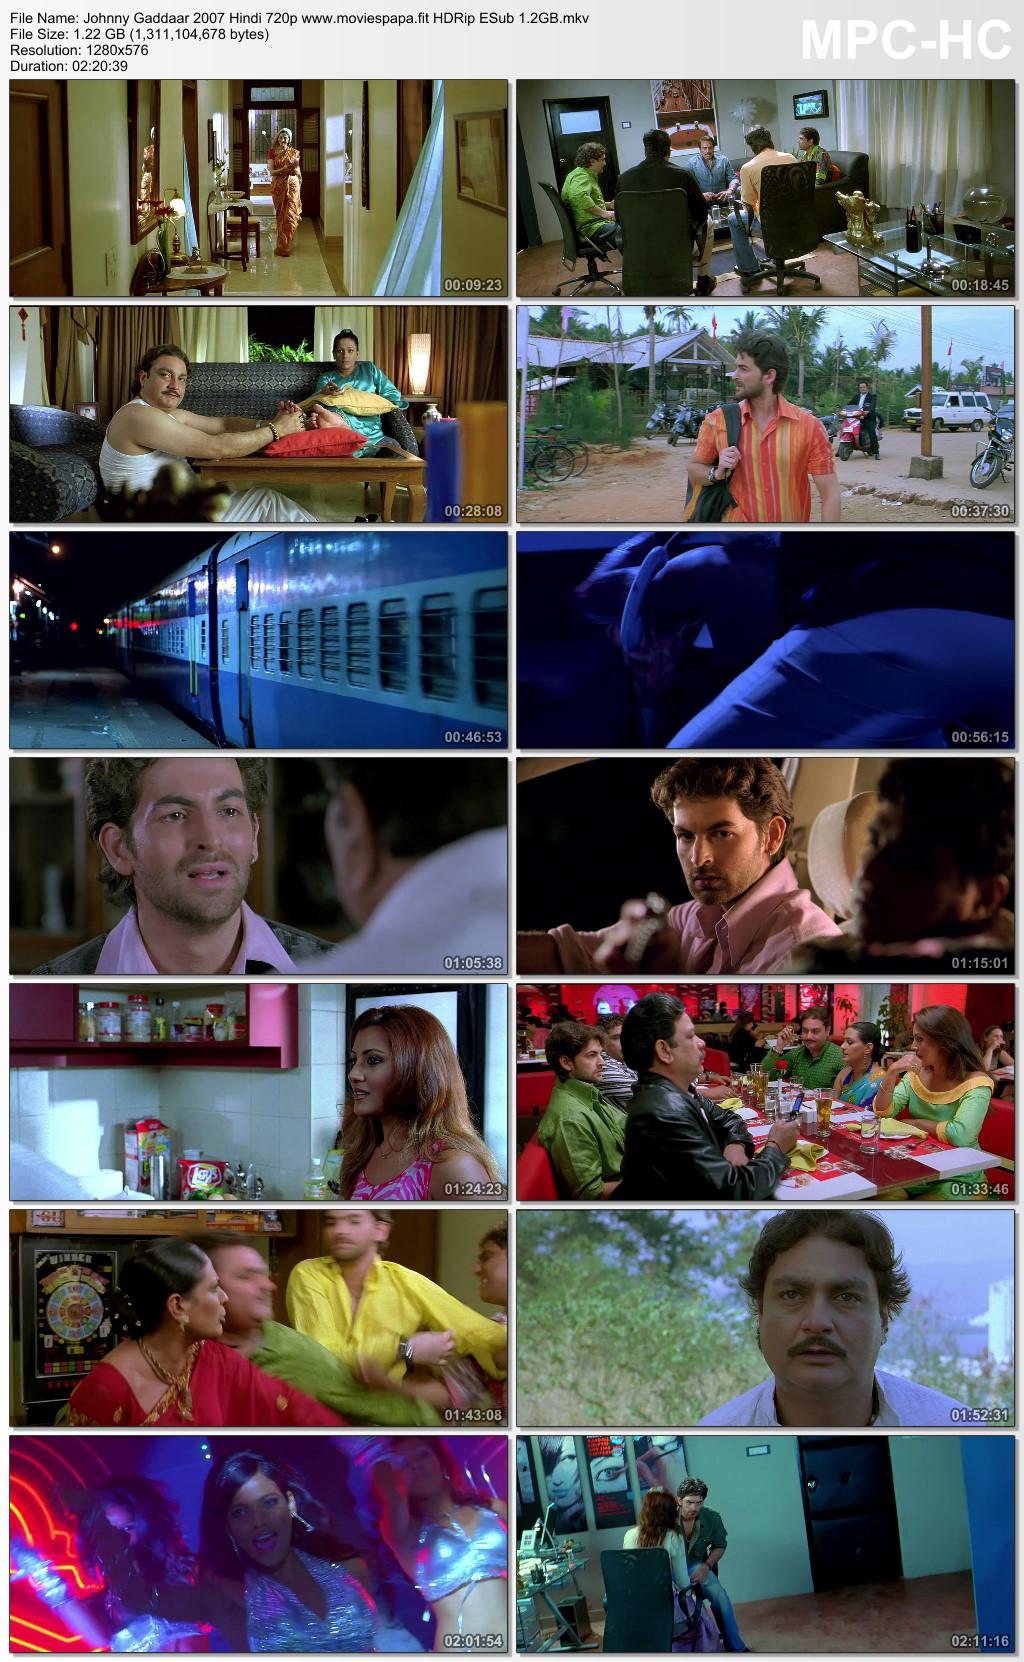 Johnny Gaddaar 2007 Hindi Movie 720p HDRip ESub 1.3GB Download